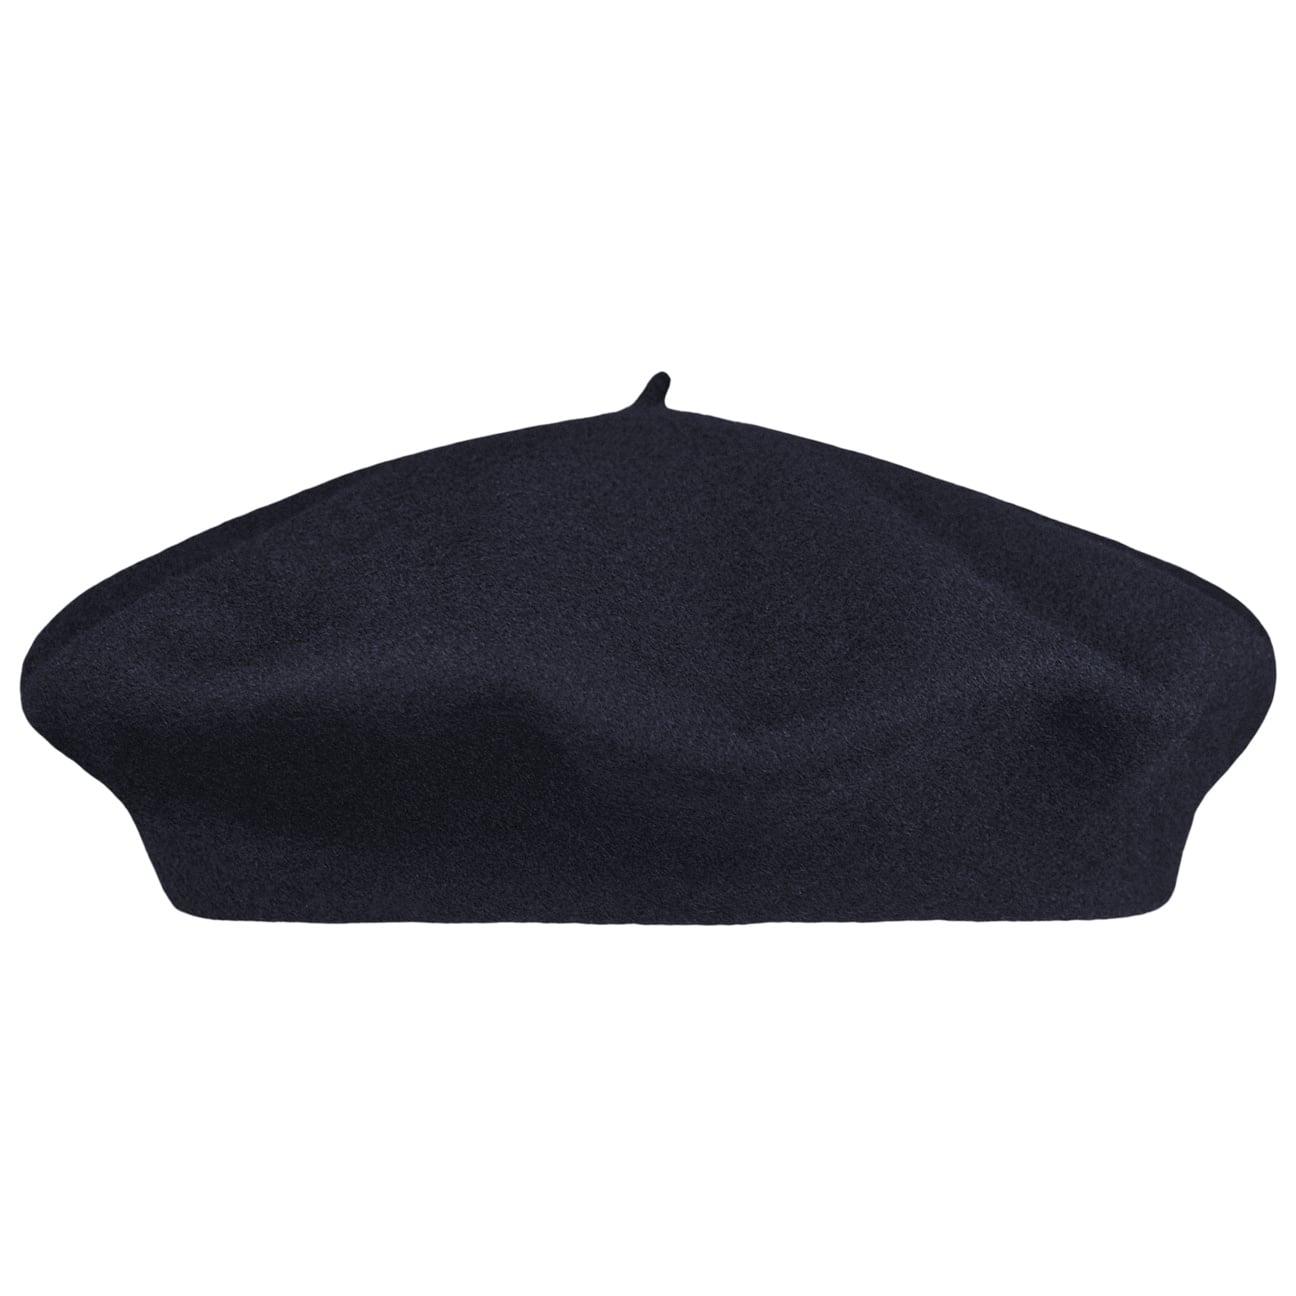 9c630c1bbd575 Boina Vasca - Gorros - sombreroshop.es